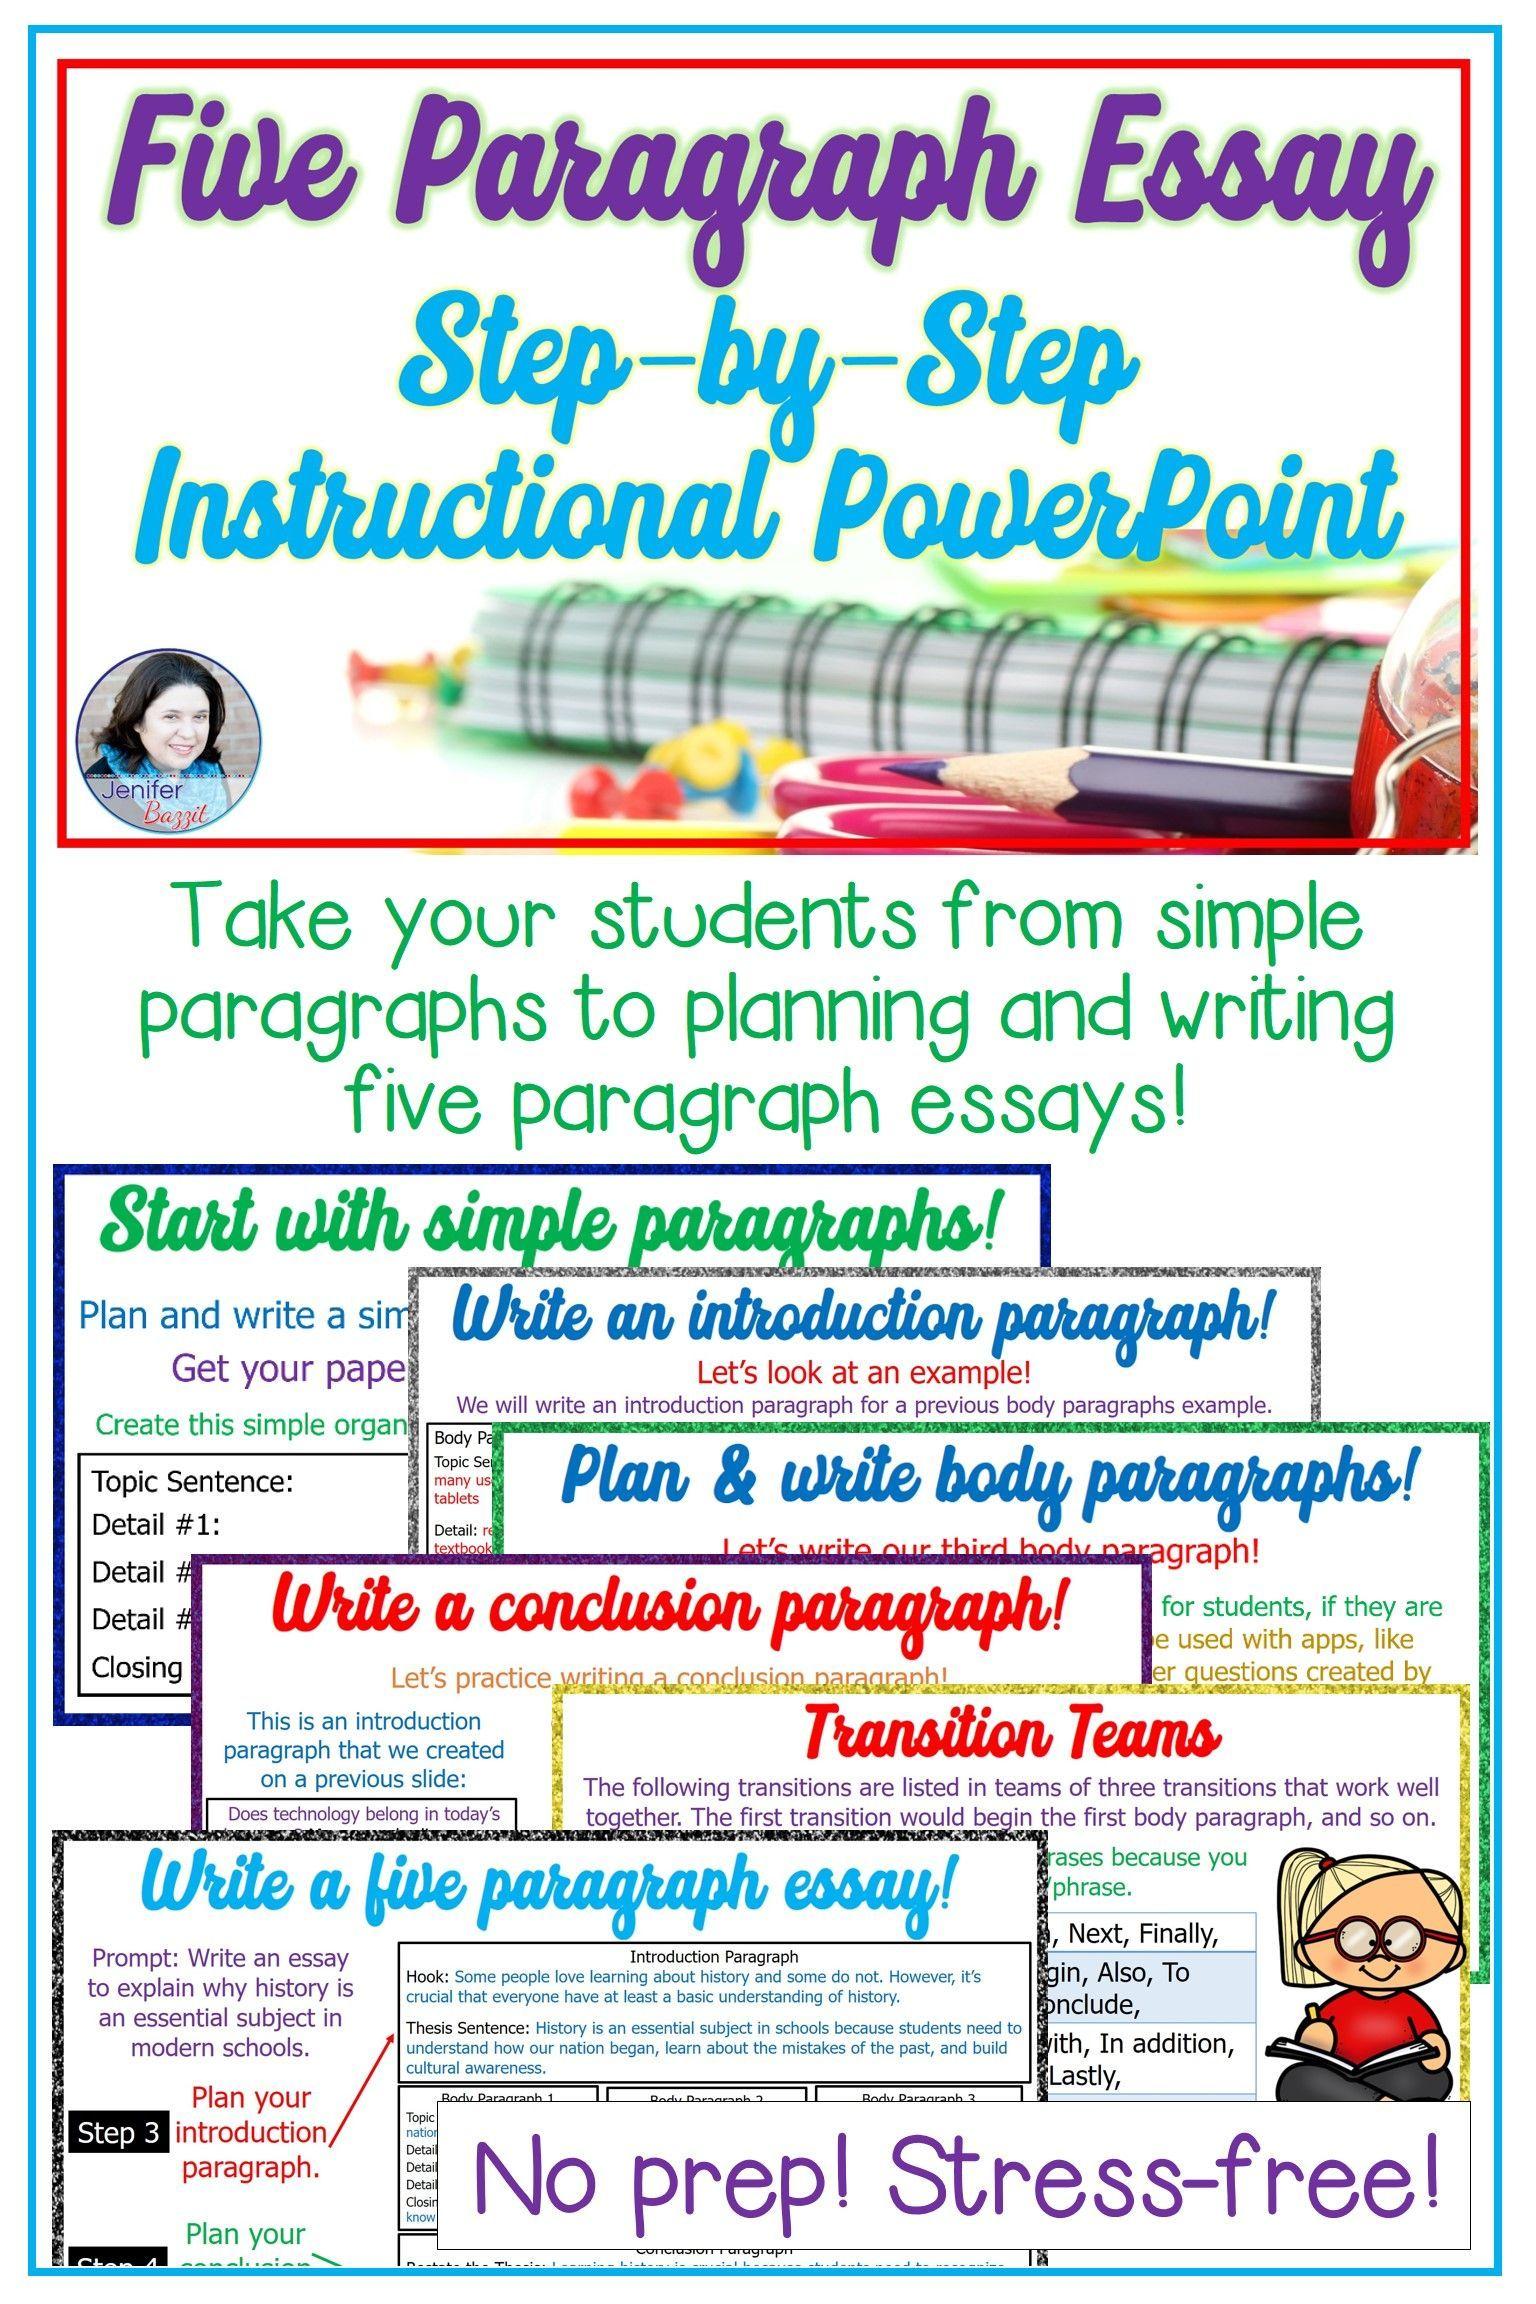 Five Paragraph Essay PowerPoint  Paragraph essay, Writing